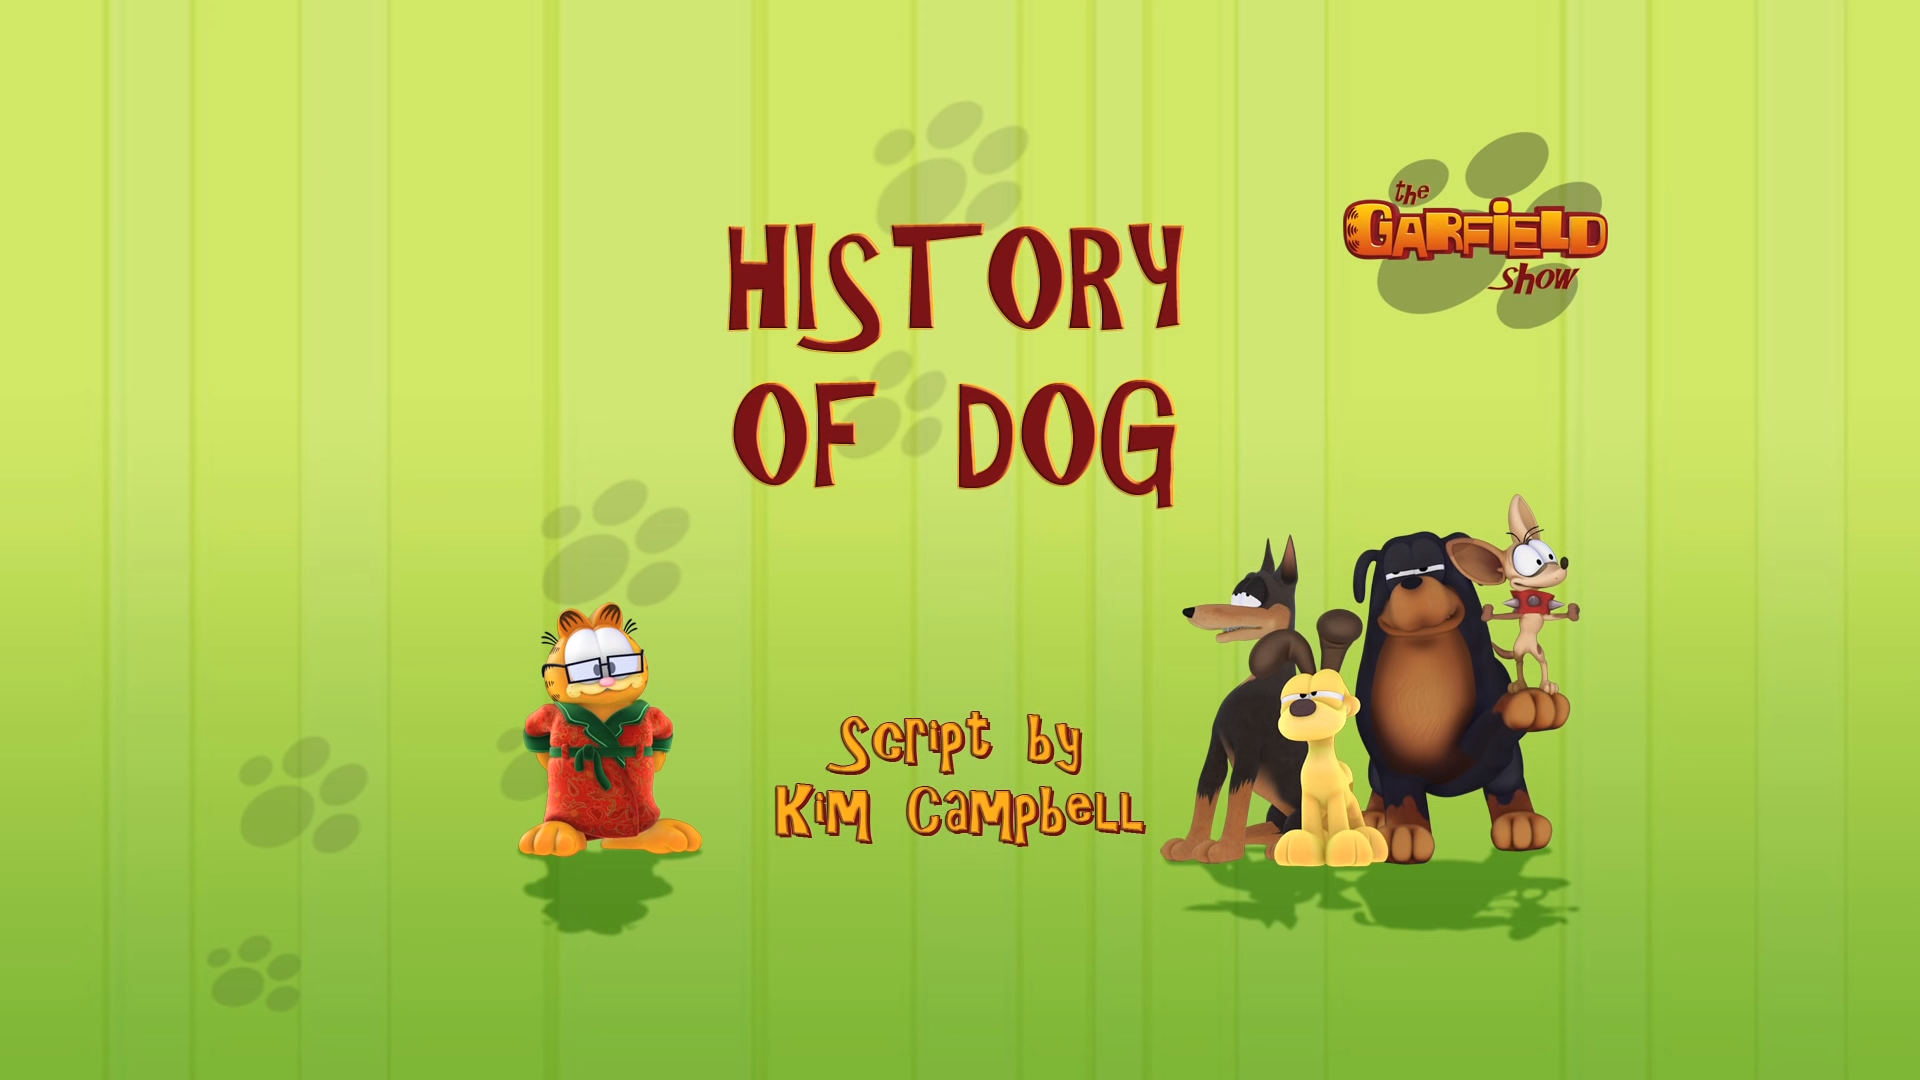 History of Dog